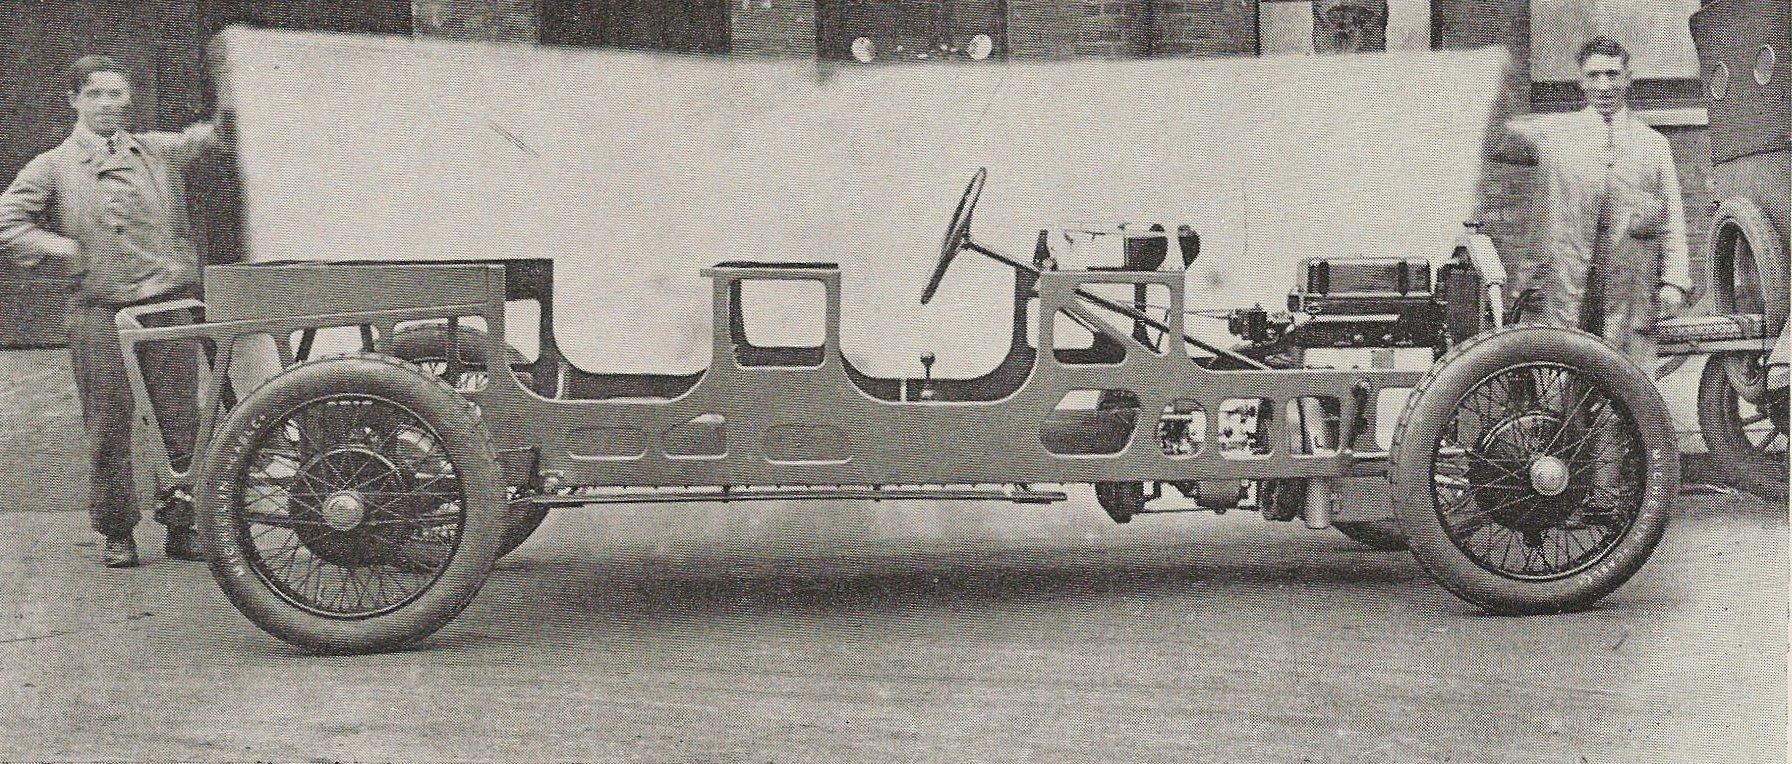 http://revivaler.com/wp-content/uploads/2016/05/1922-Lancia-Lambda-1st-Series-Torpedo-simanaitissays.com_.jpg